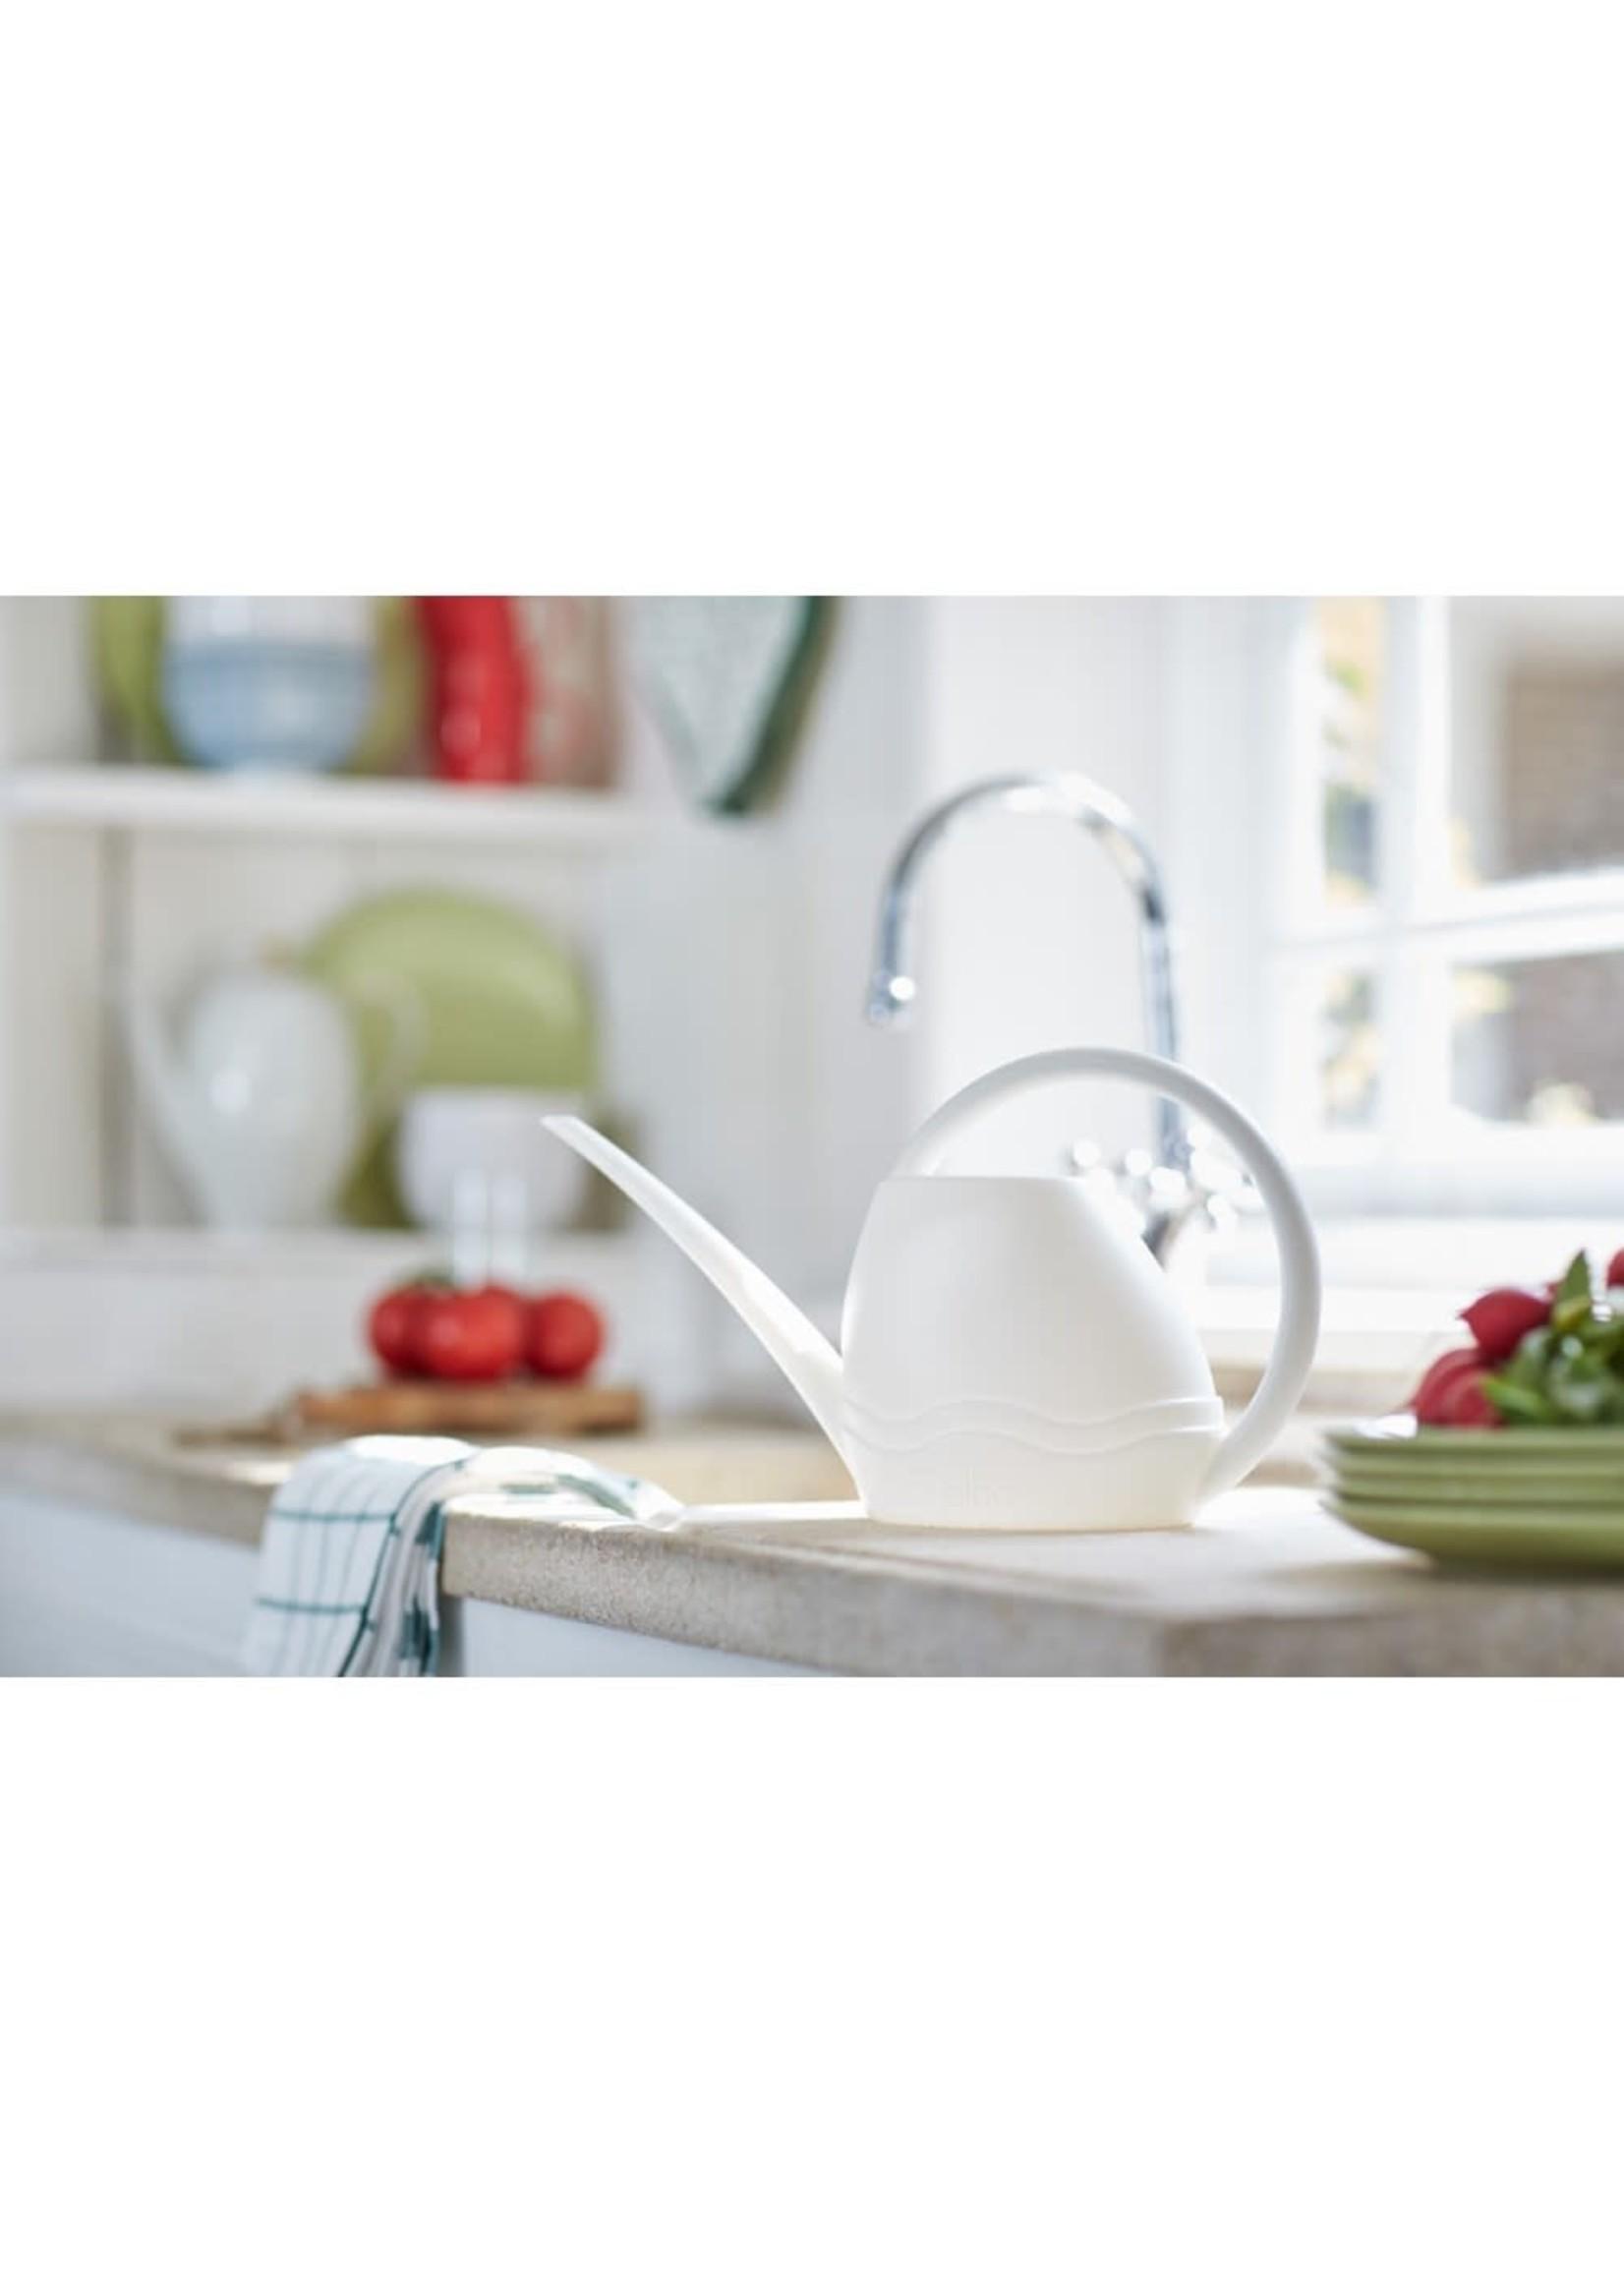 Elho Aquarius Watering Can 1.5L White